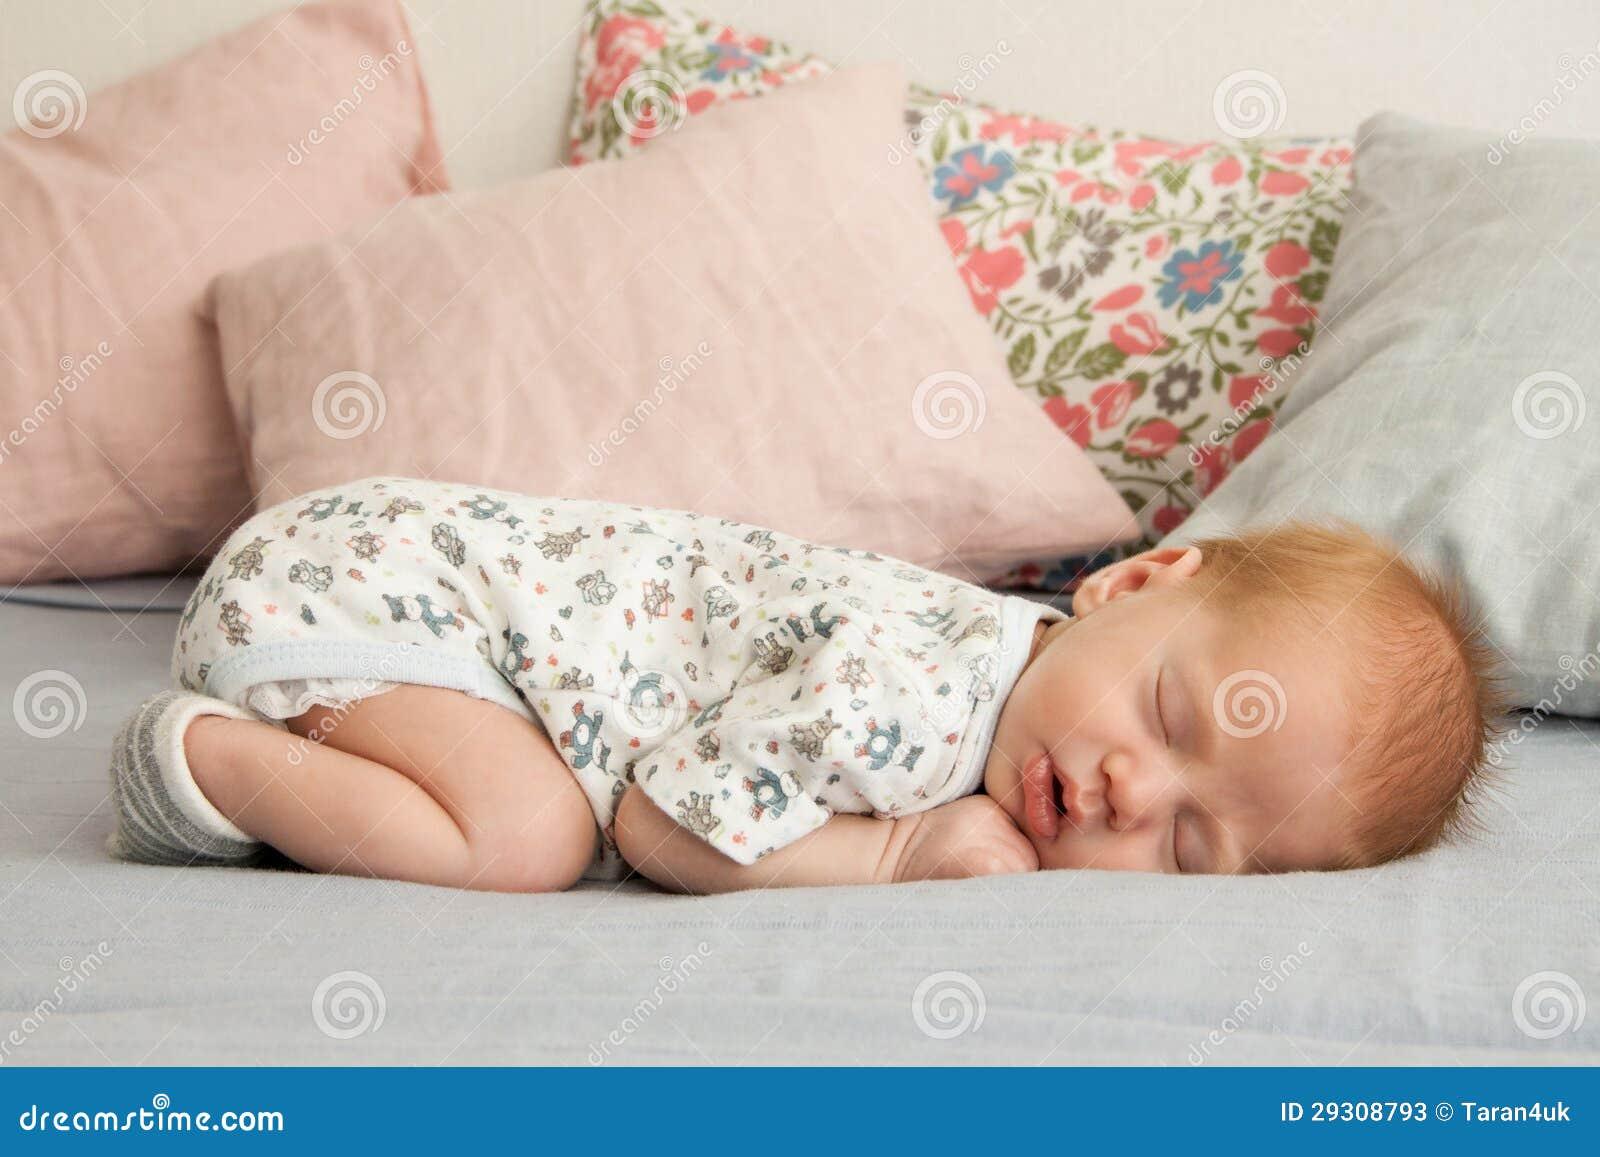 2019 year for girls- Newborn Cute baby boy sleeping pictures